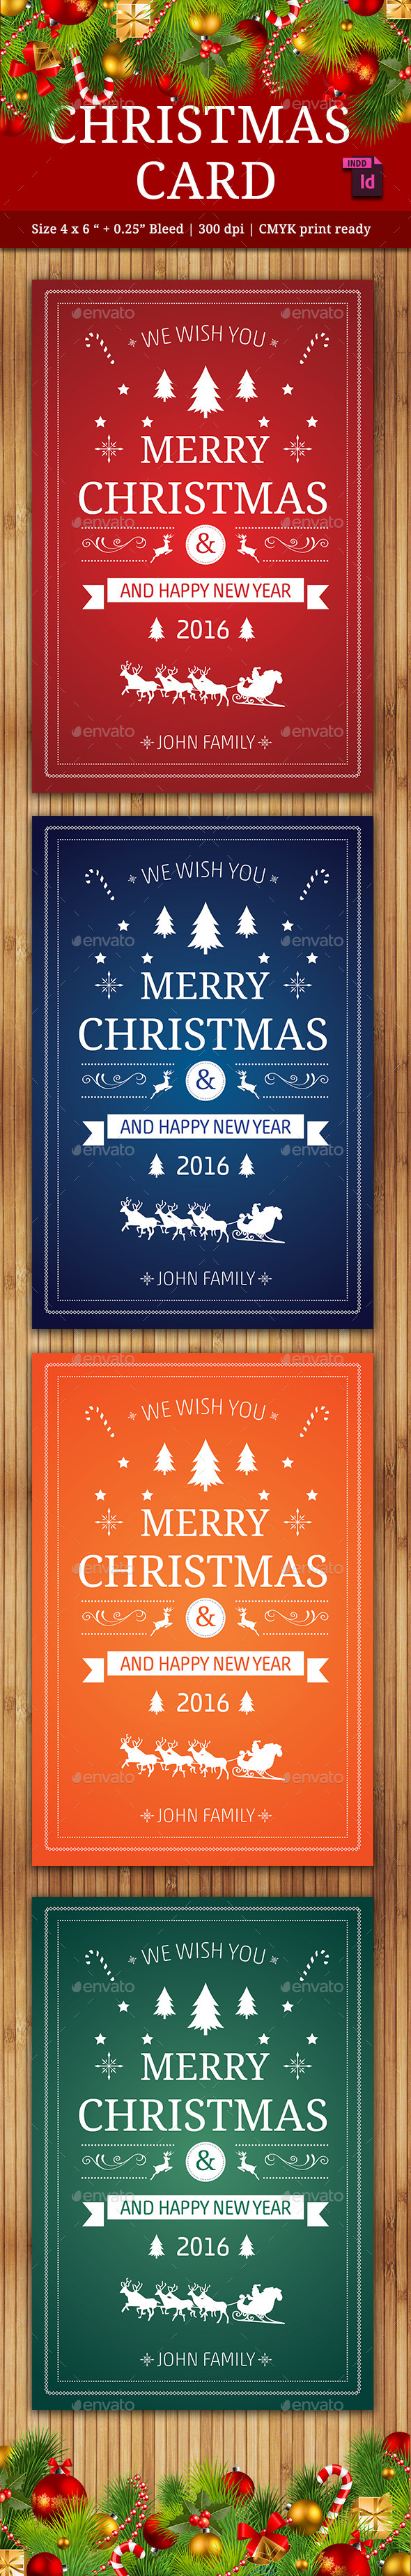 Christmas Card Vol. 2 - Cards & Invites Print Templates